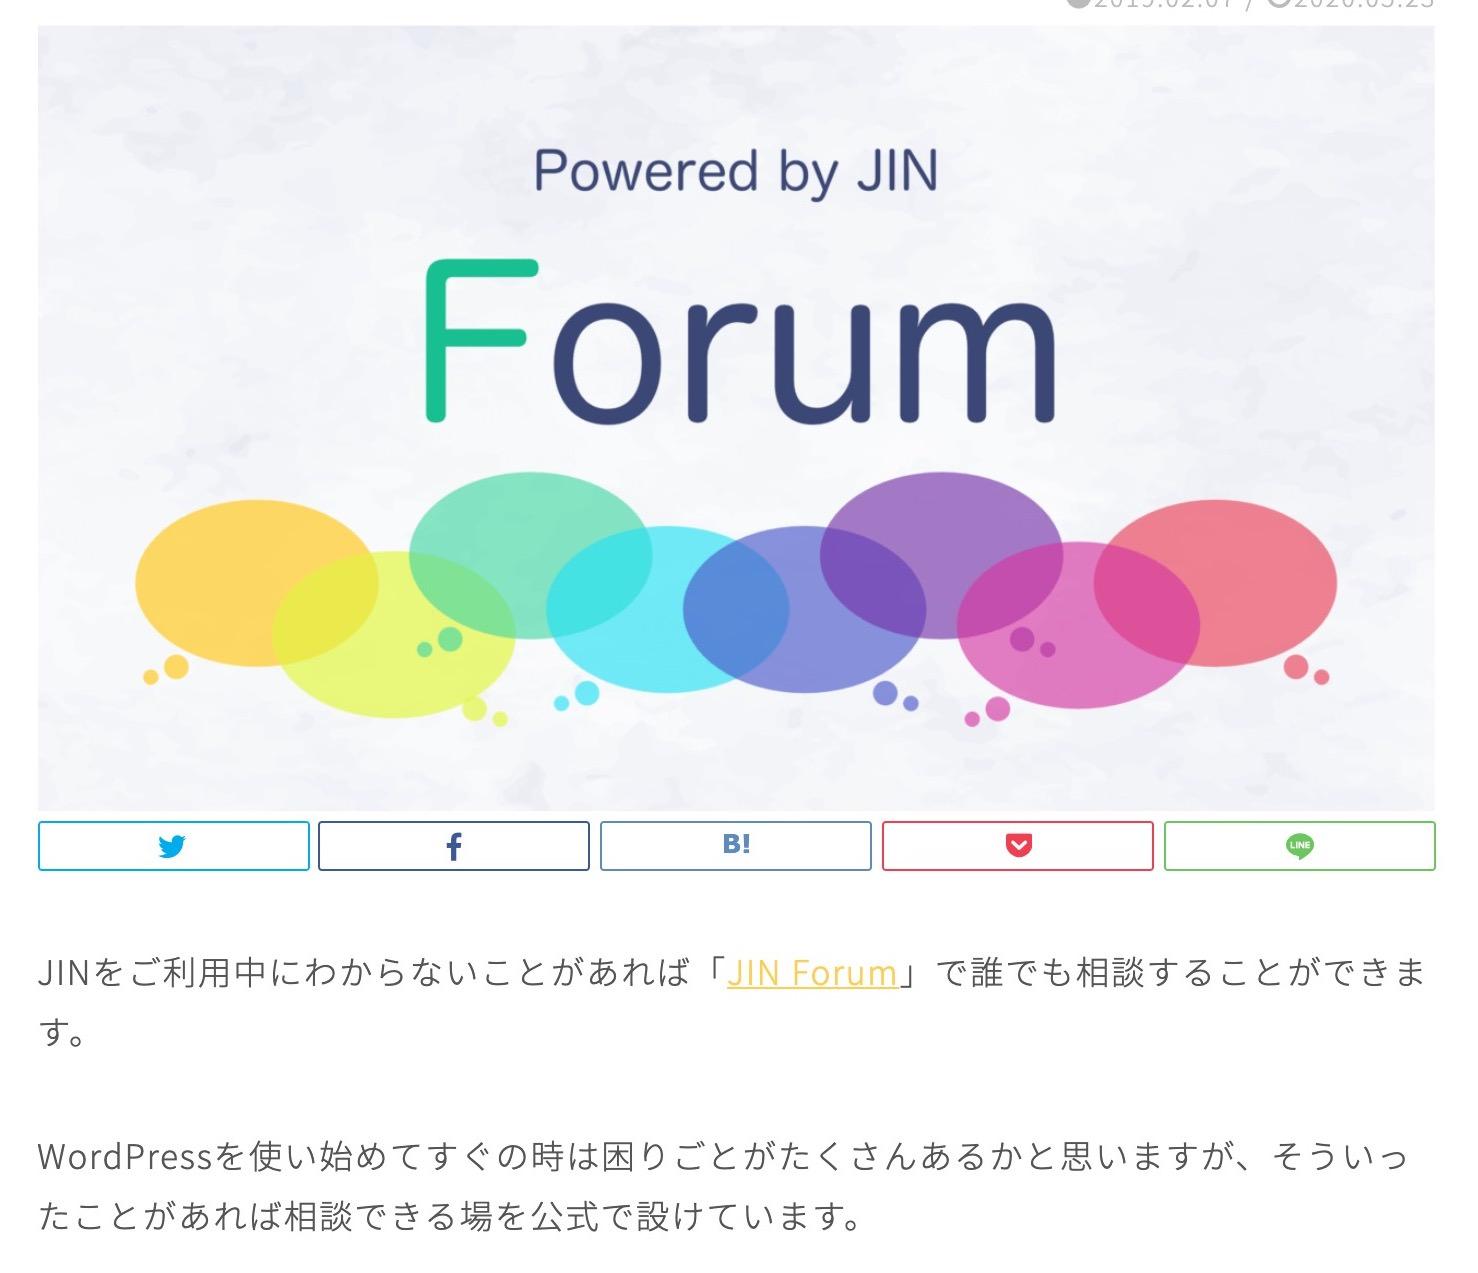 JIN Forum